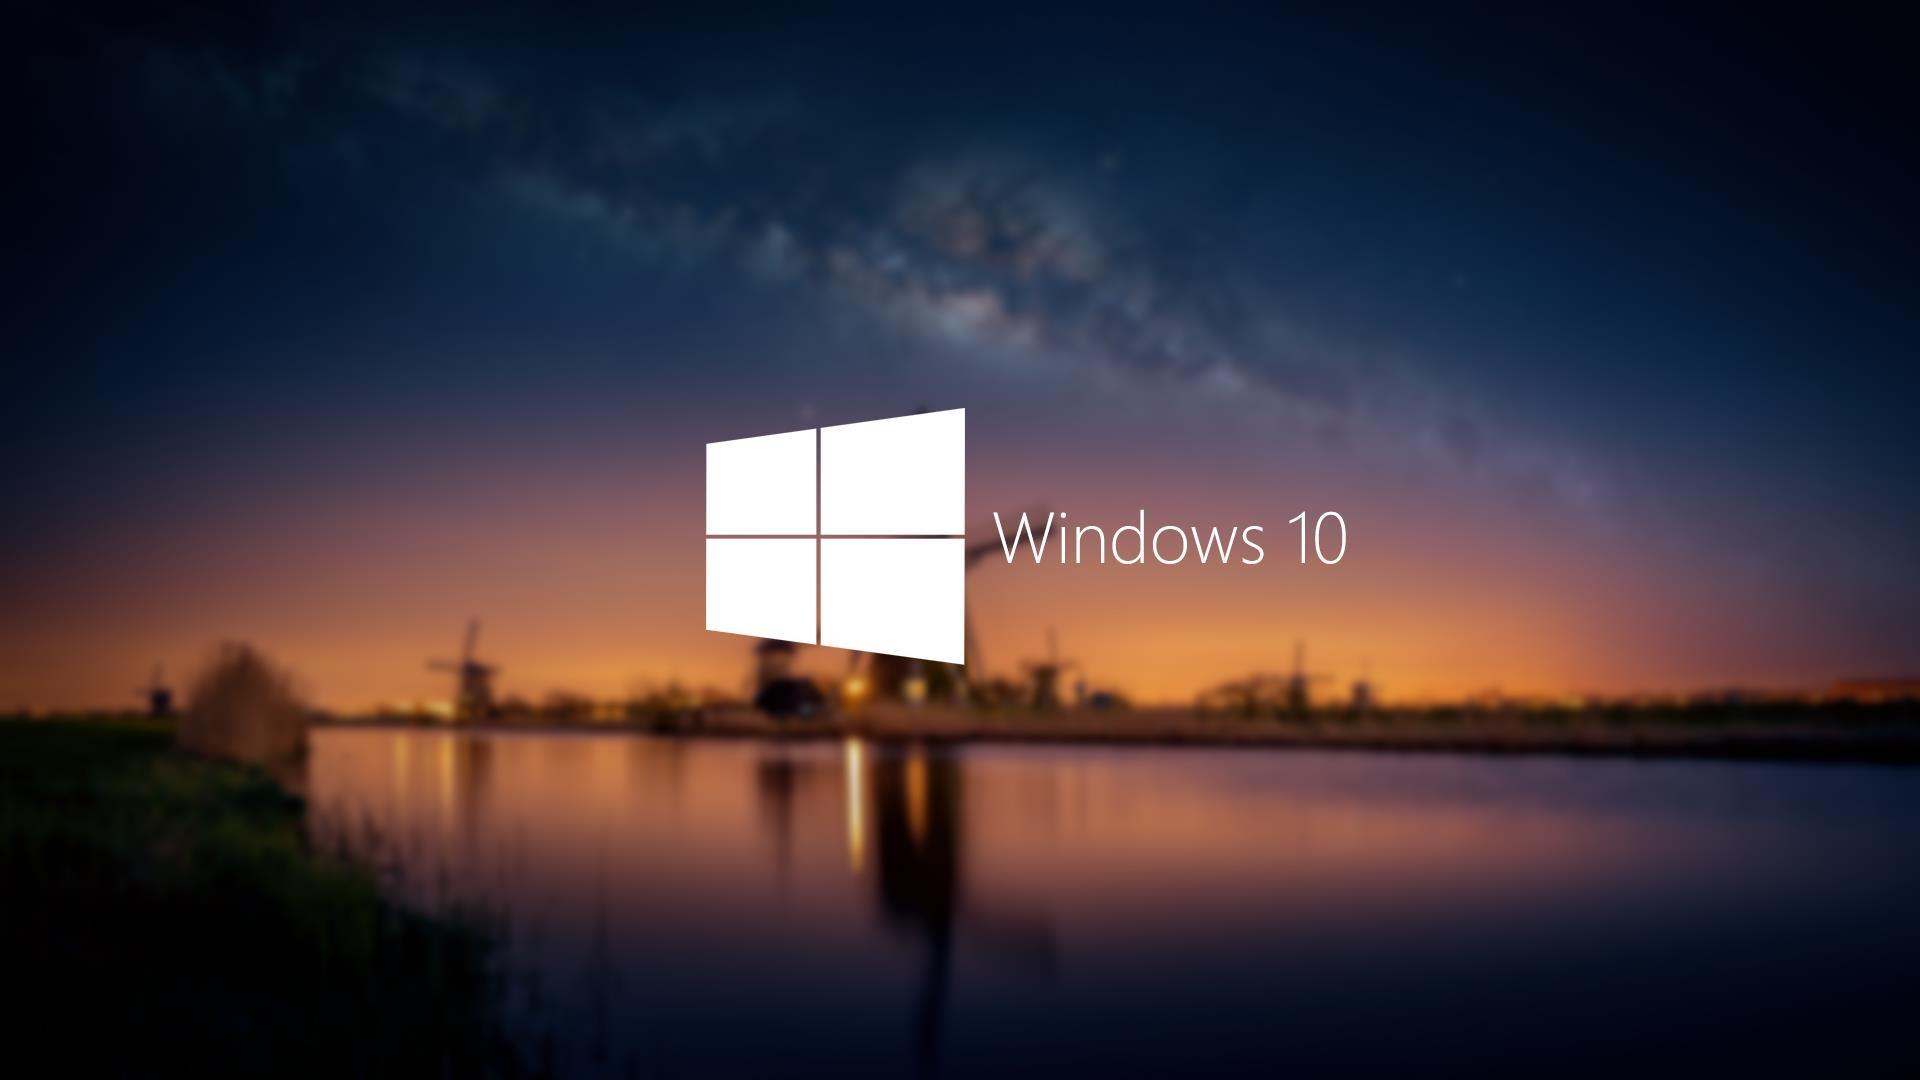 1920x1080 Stunning Windows 10 Wallpapers